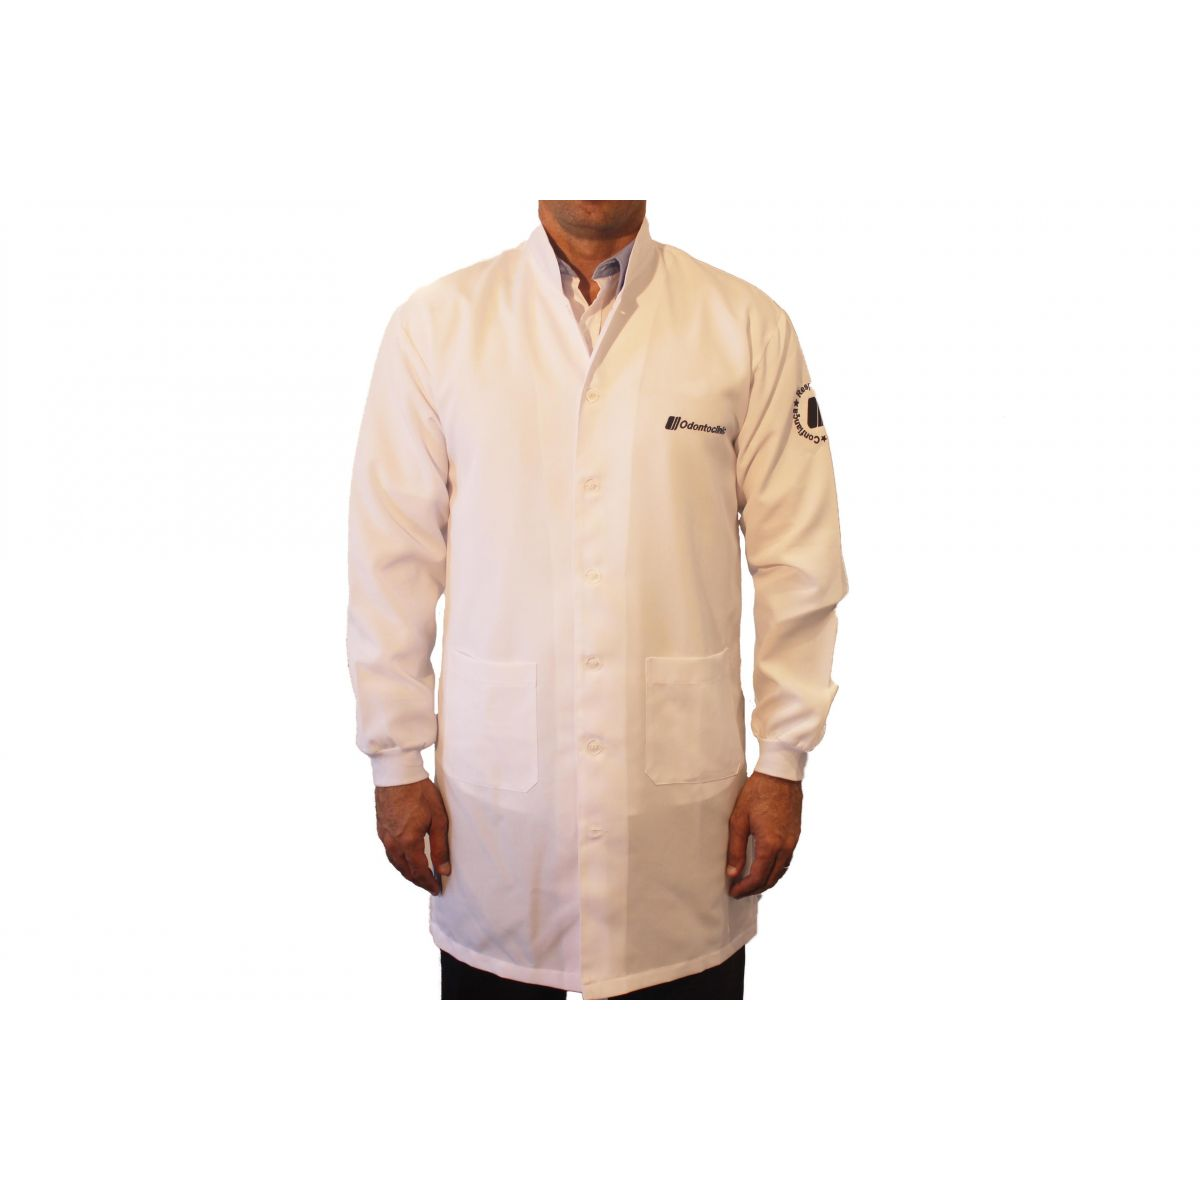 Avental Masculino Cirurgião em Two Way  - Uniformes Odontoclinic